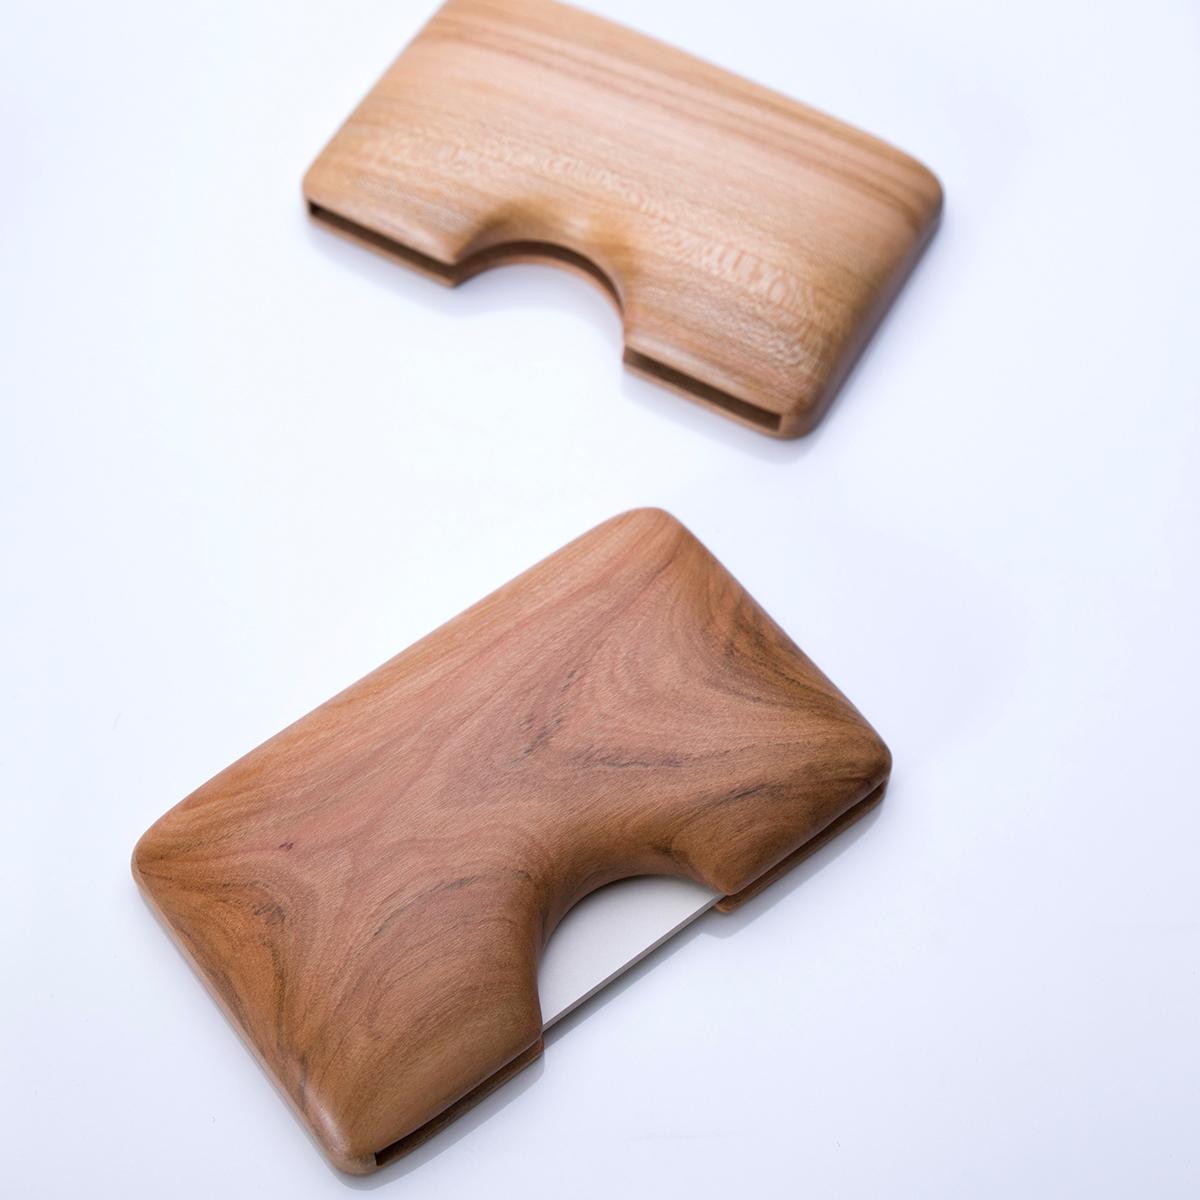 KIMURA WOODCRAFT FACTORY りんごの木の名刺入れ 木村木品製作所